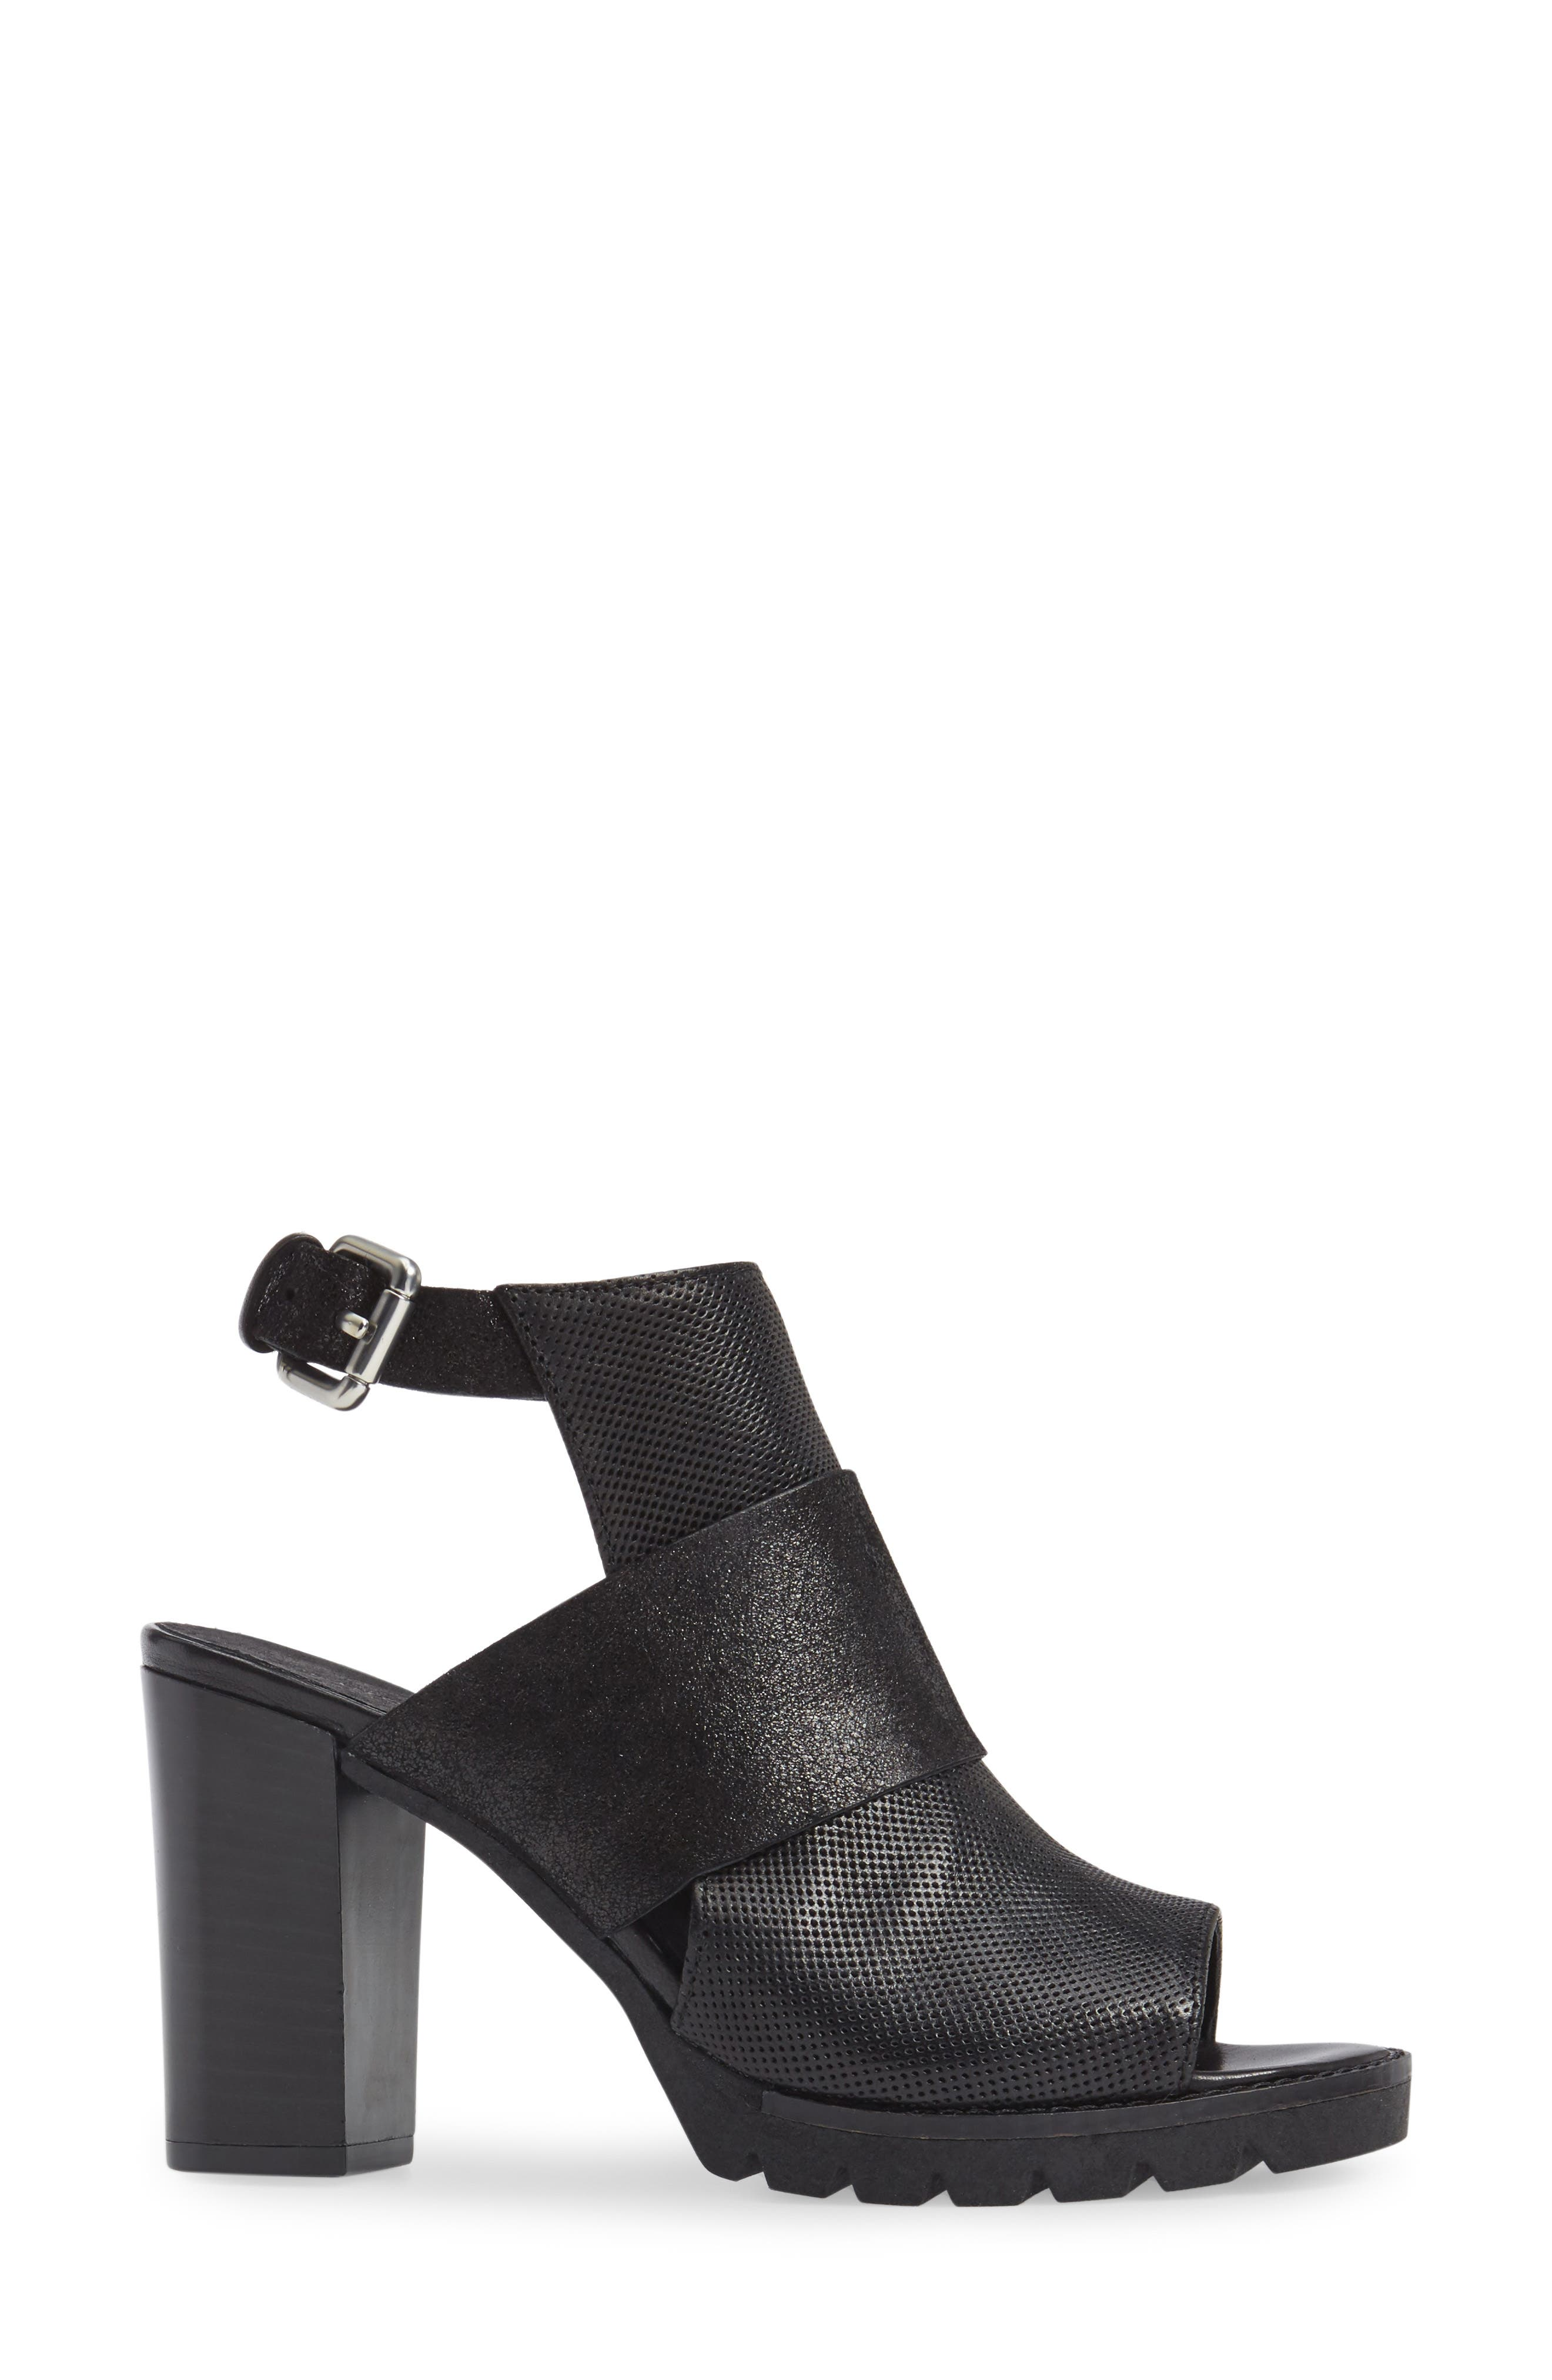 Brittni Block Heel Sandal,                             Alternate thumbnail 3, color,                             001